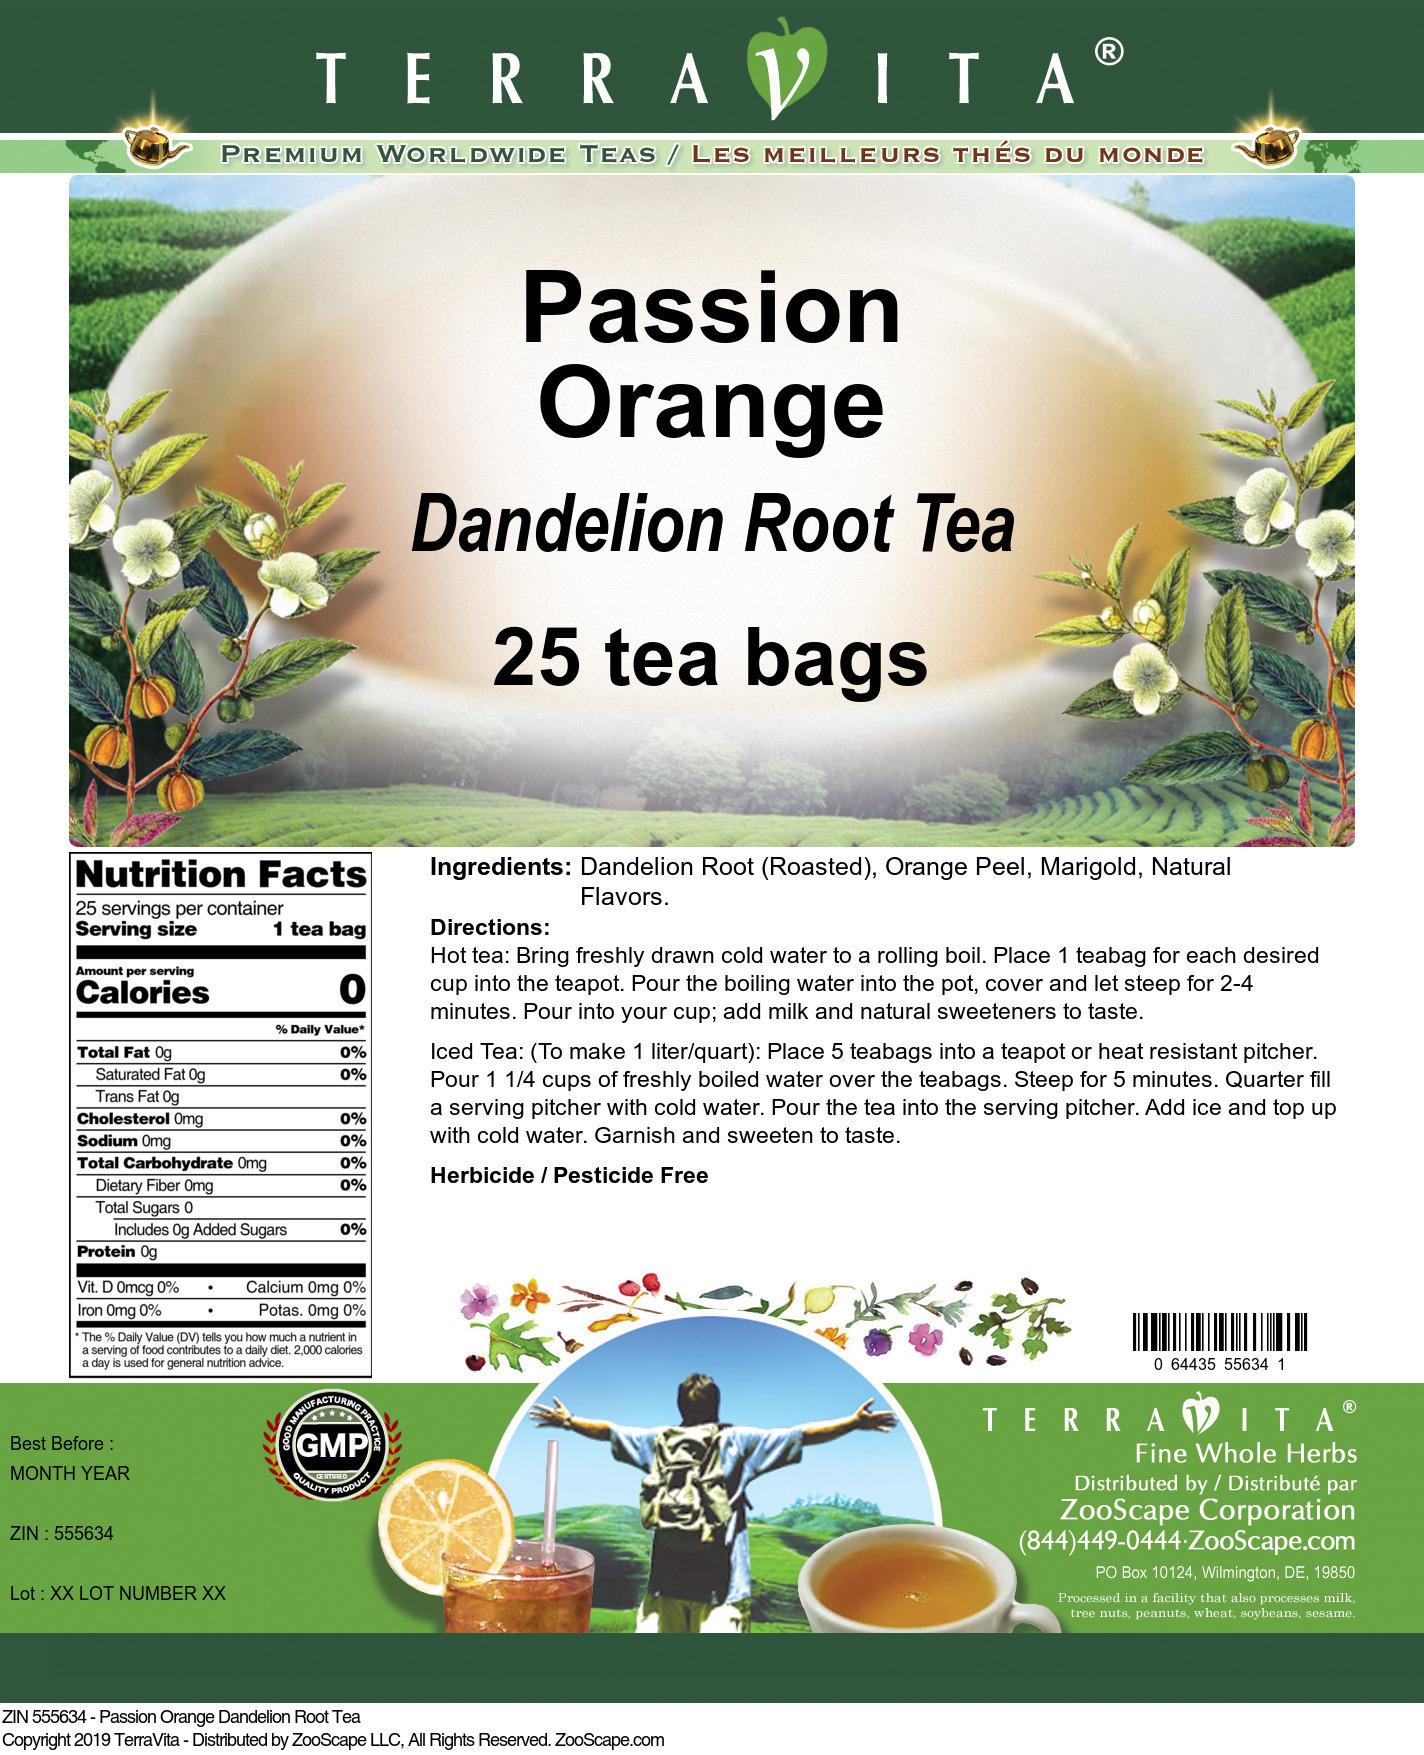 Passion Orange Dandelion Root